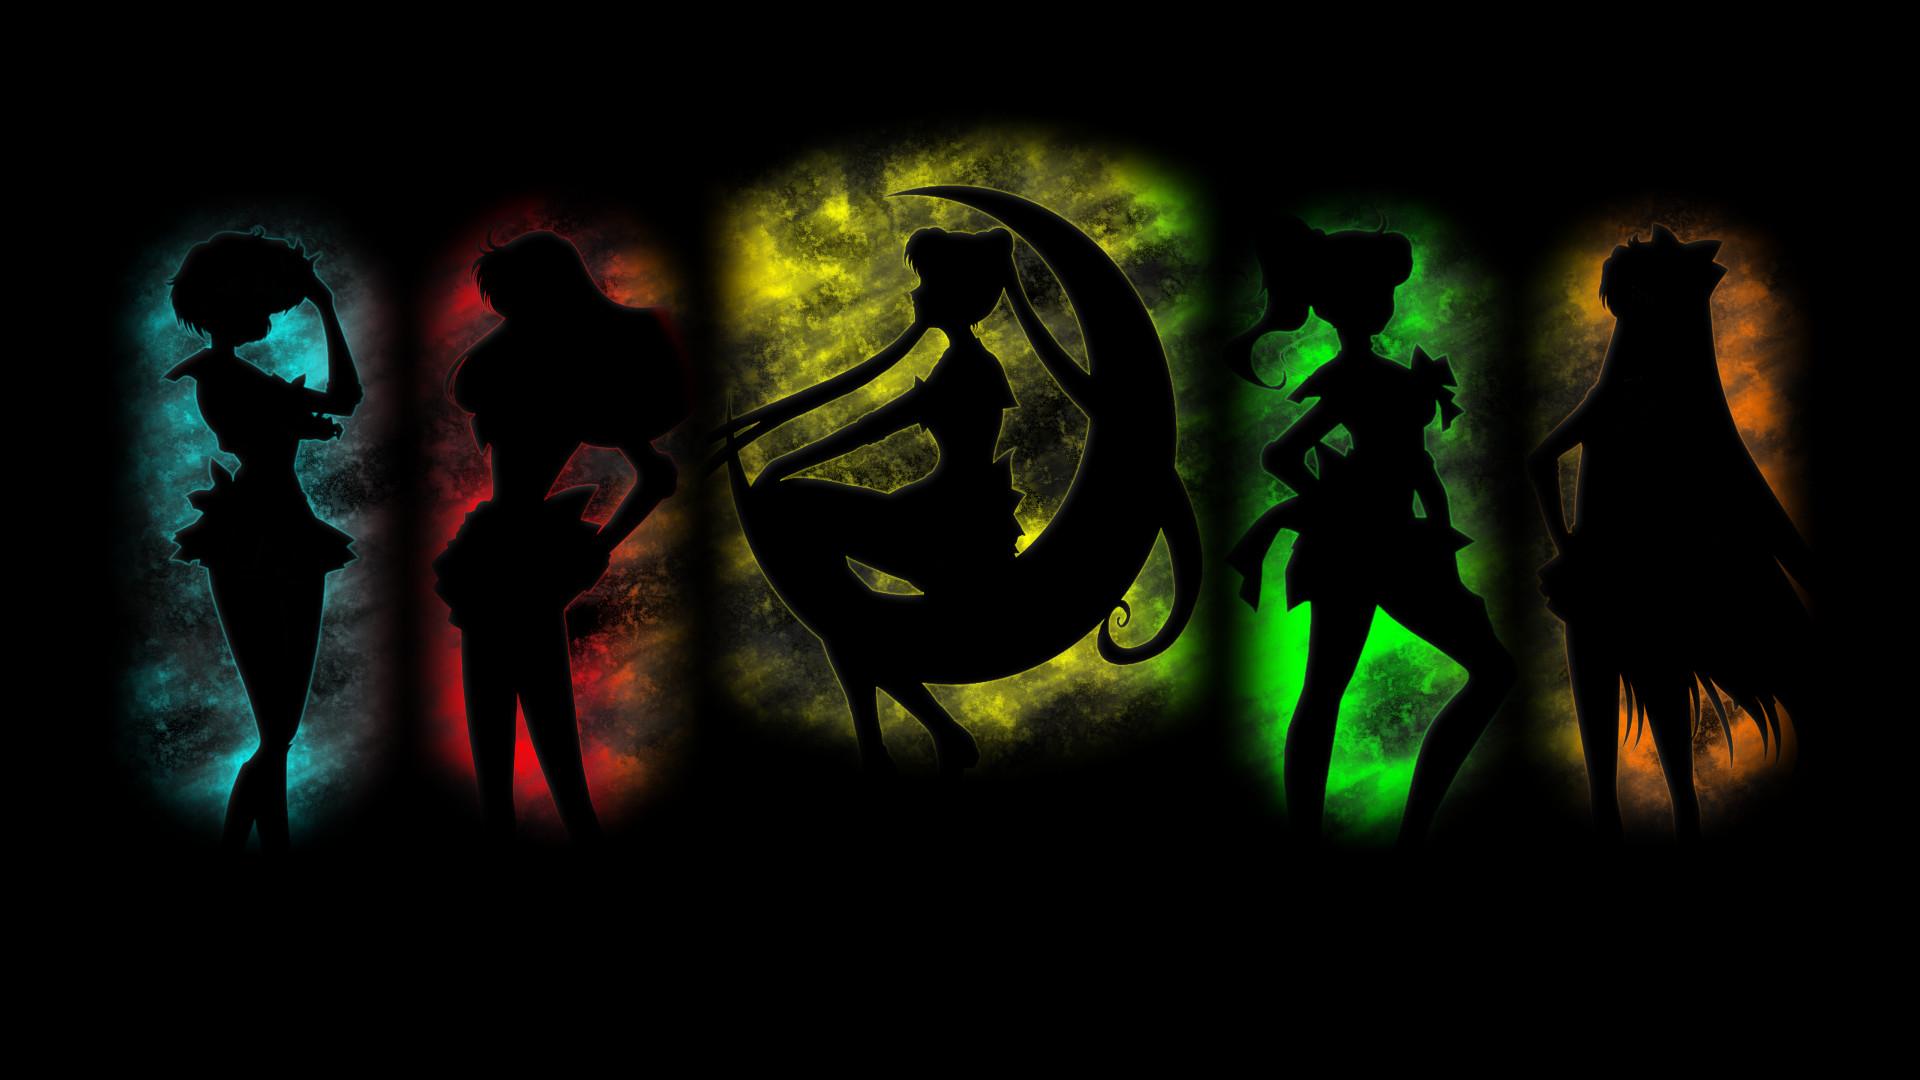 Sailor Moon Wallpaper 1 by CommandoJimmoTheIII Sailor Moon Wallpaper 1 by  CommandoJimmoTheIII